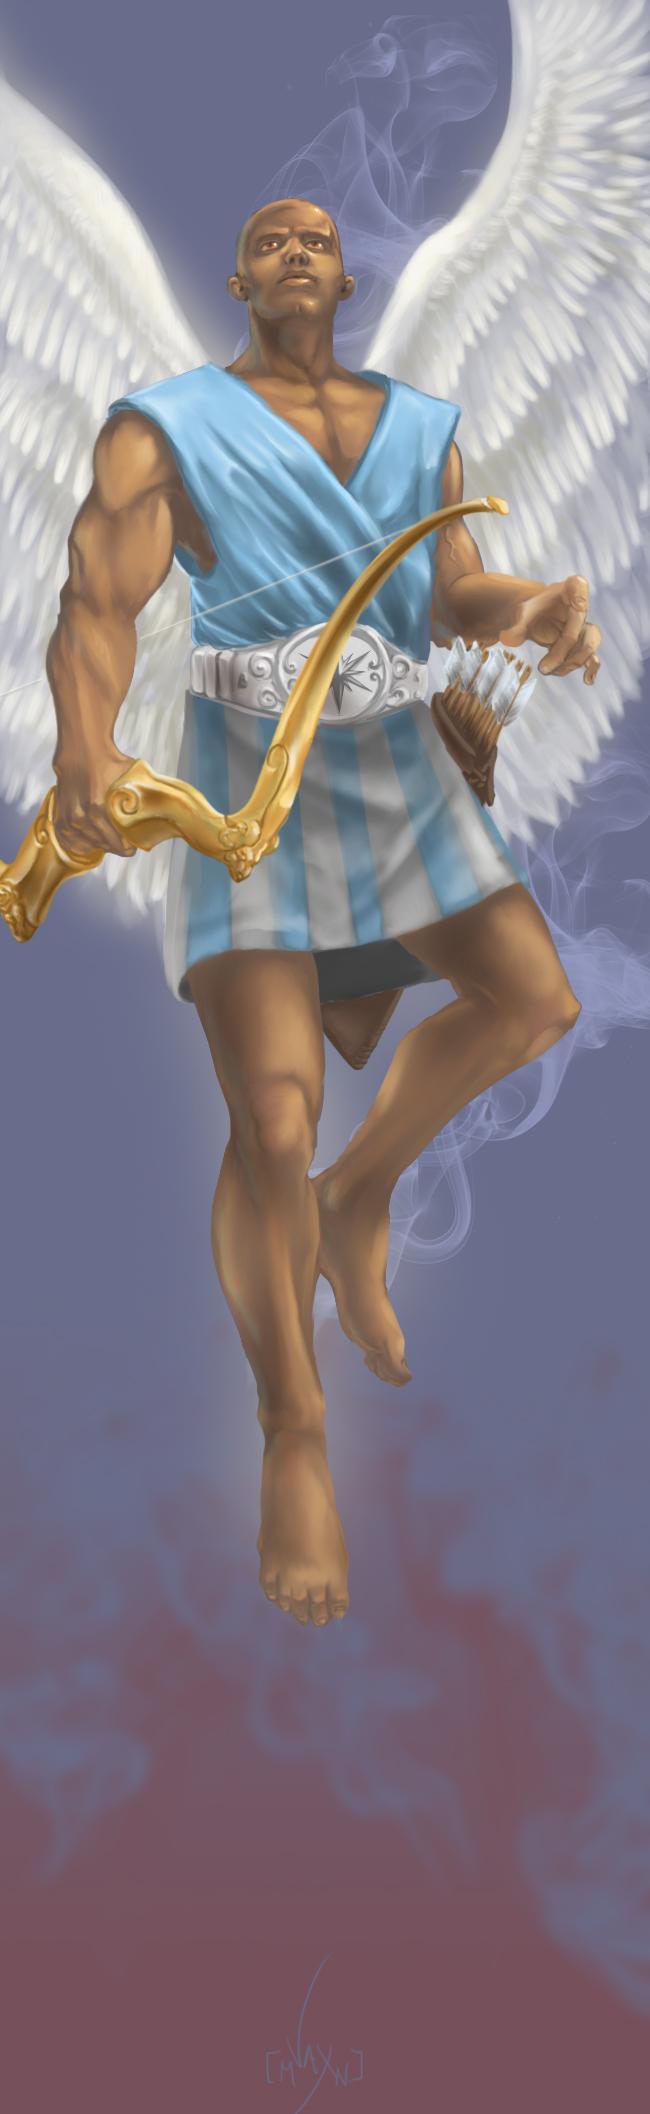 L'ange Eudialyte. Crédit de l'illustration: Eric Vaxman